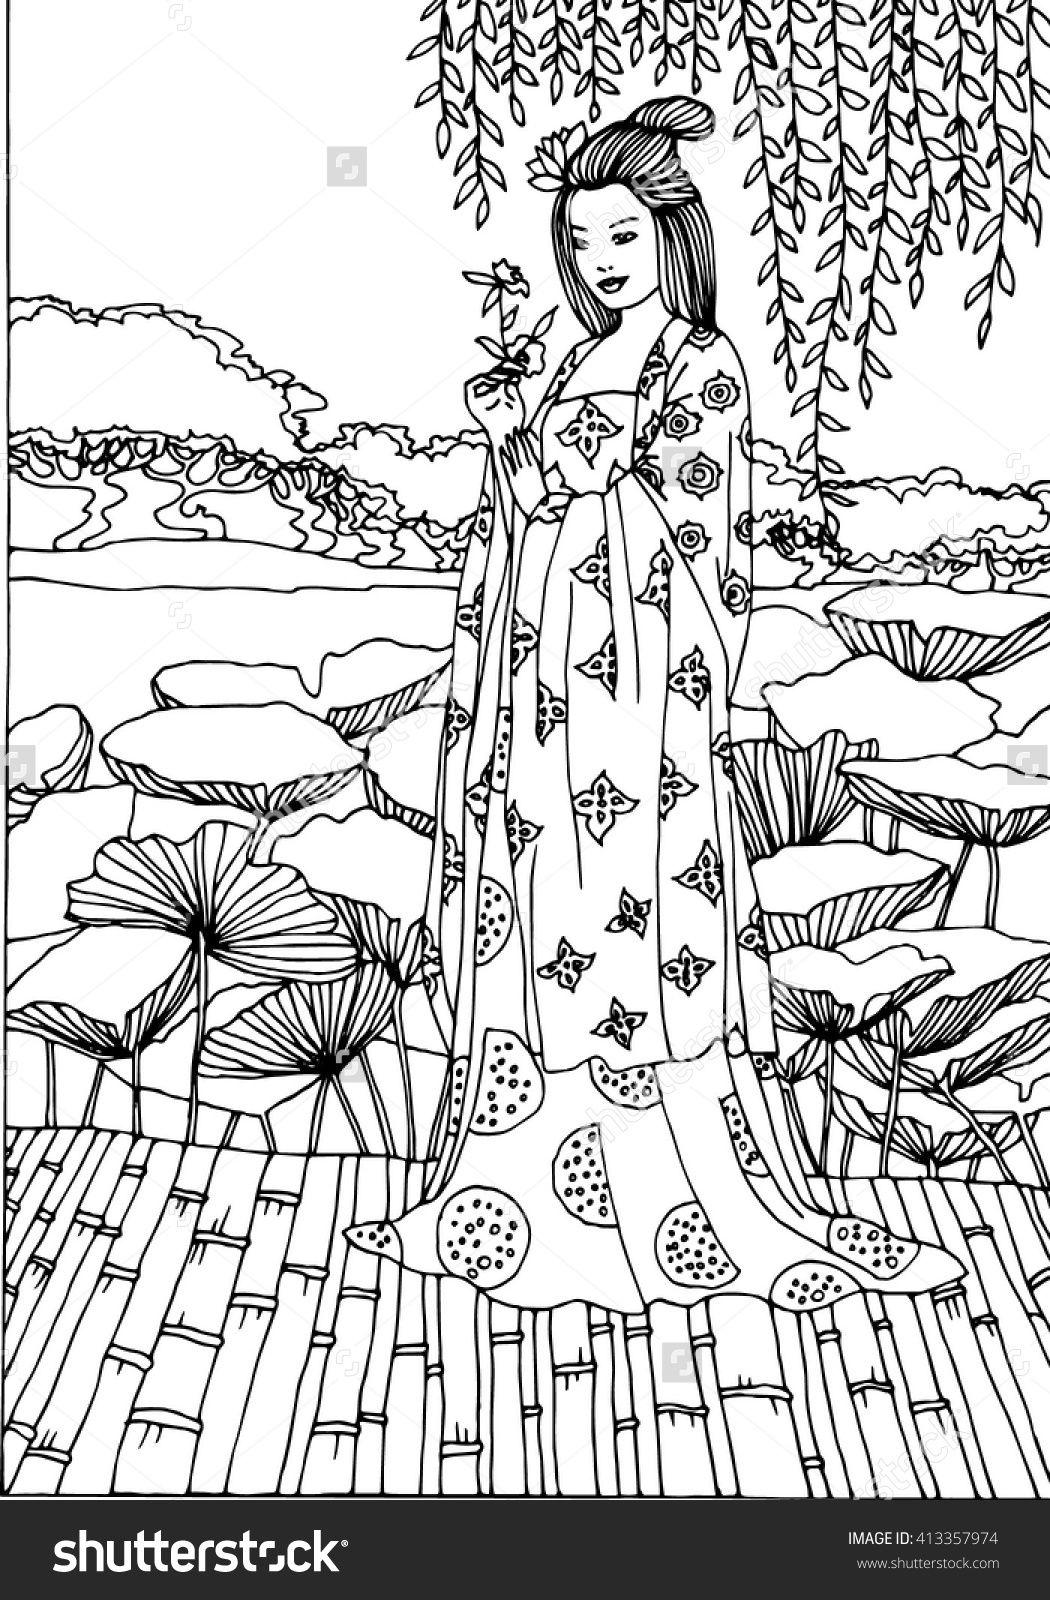 Japan geisha illustration | Shutterstock 413357974 | geisha ...